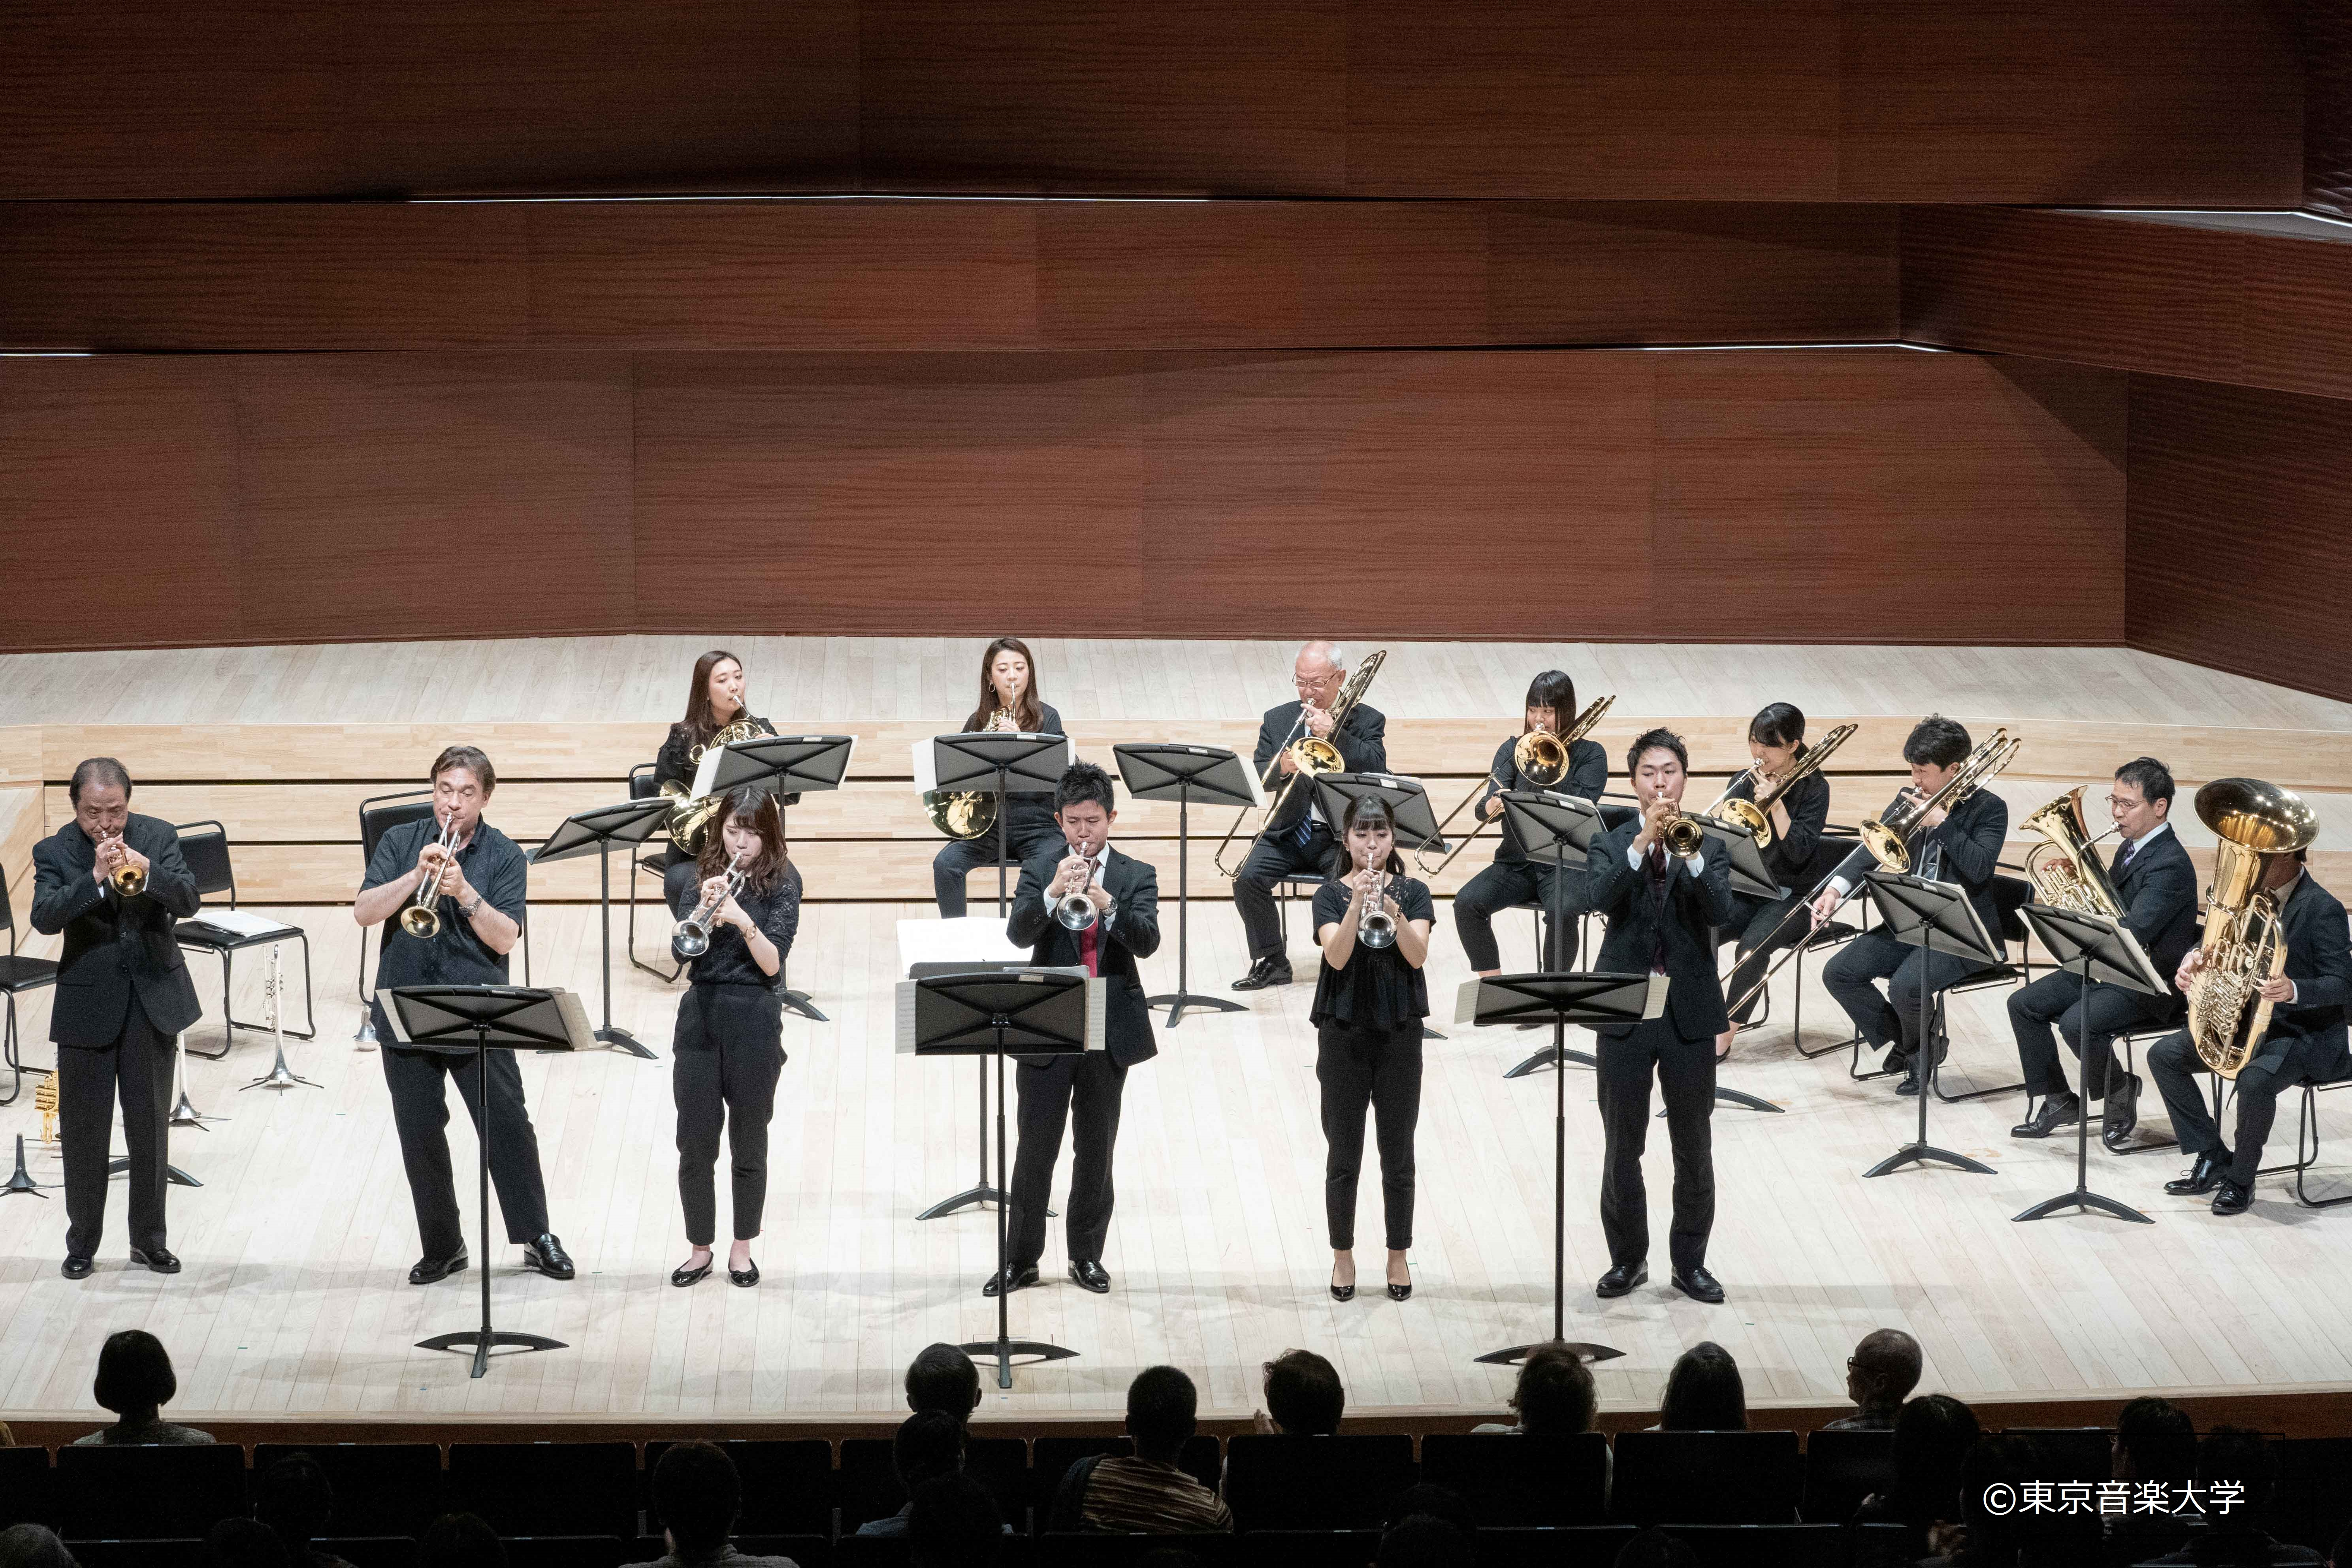 東京音楽大学創立111周年記念演奏会シリーズ 管打楽器部会主催 金管ソロ・室内楽演奏会が開催されました